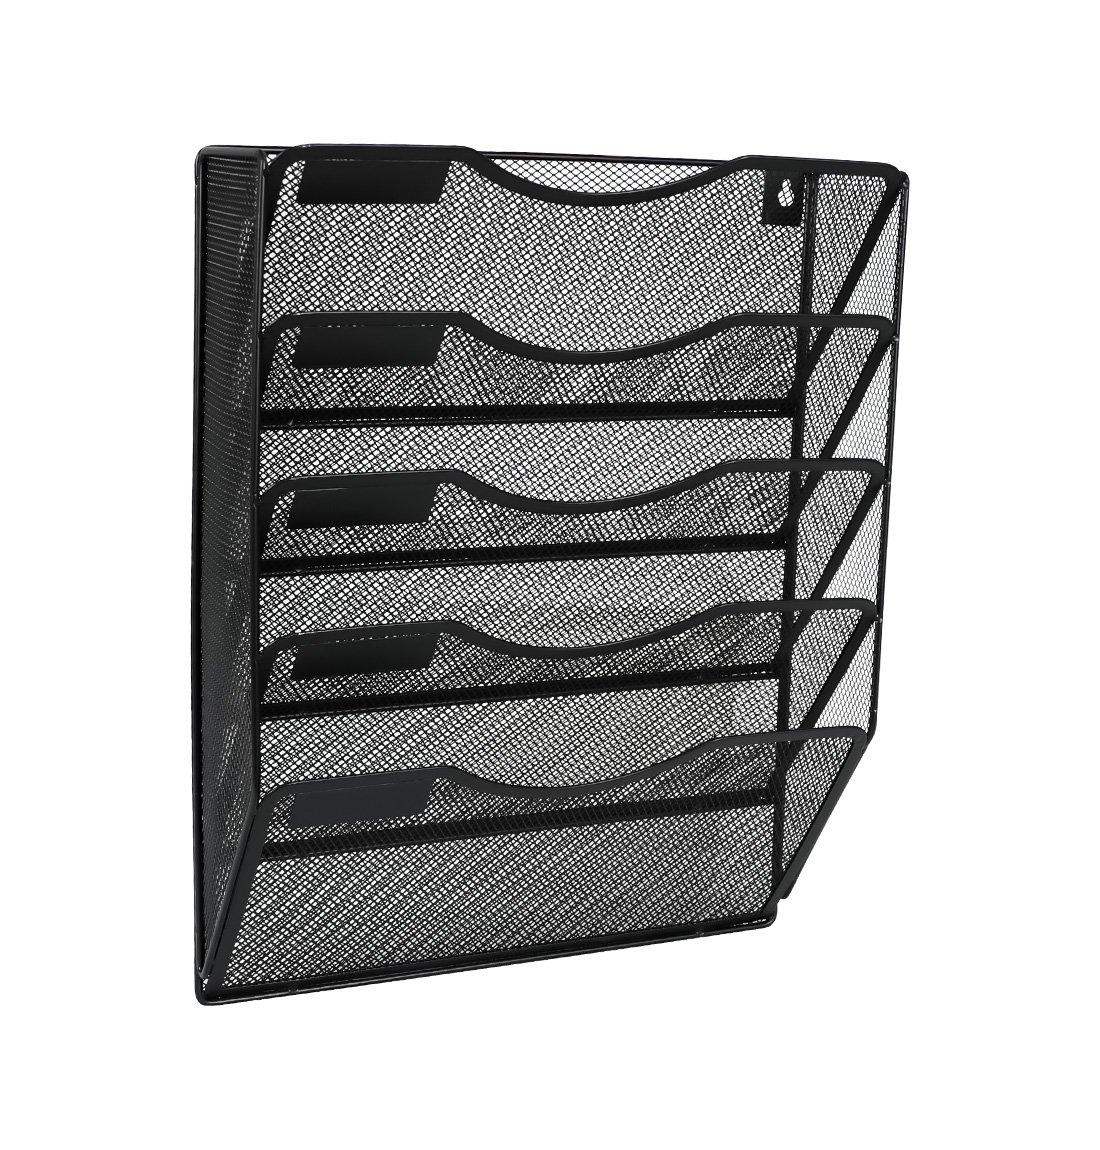 Denozer Mesh 5 Slot Wall Mount Hanging File Organizer Holder Magzine Rack,Black by Denozer